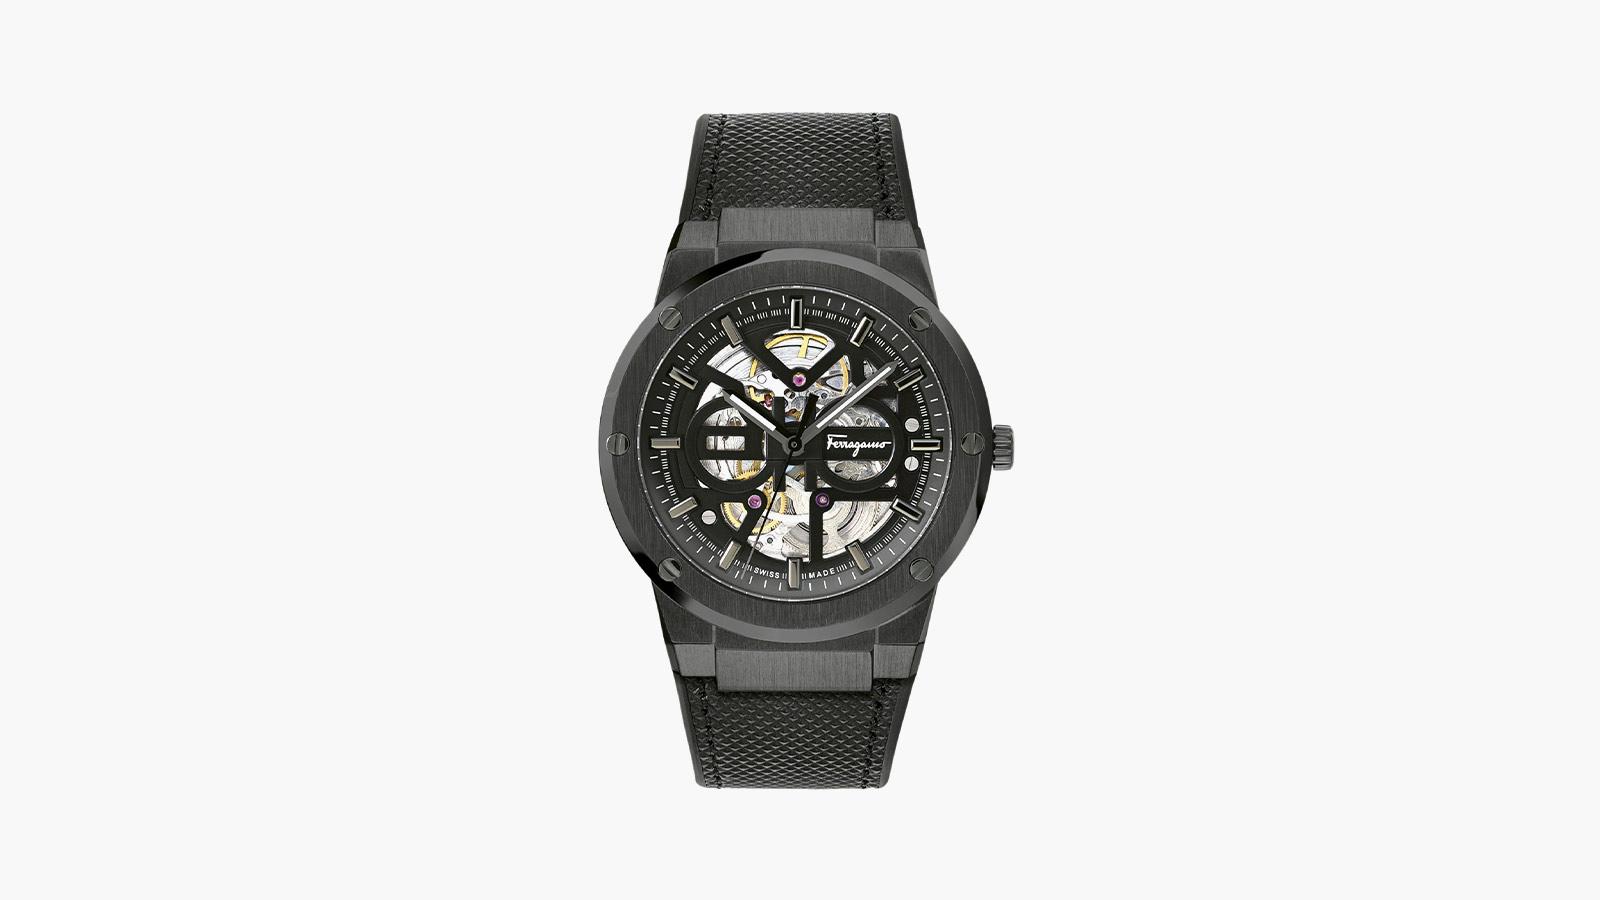 Ferragamo F-80 Skeleton Watch